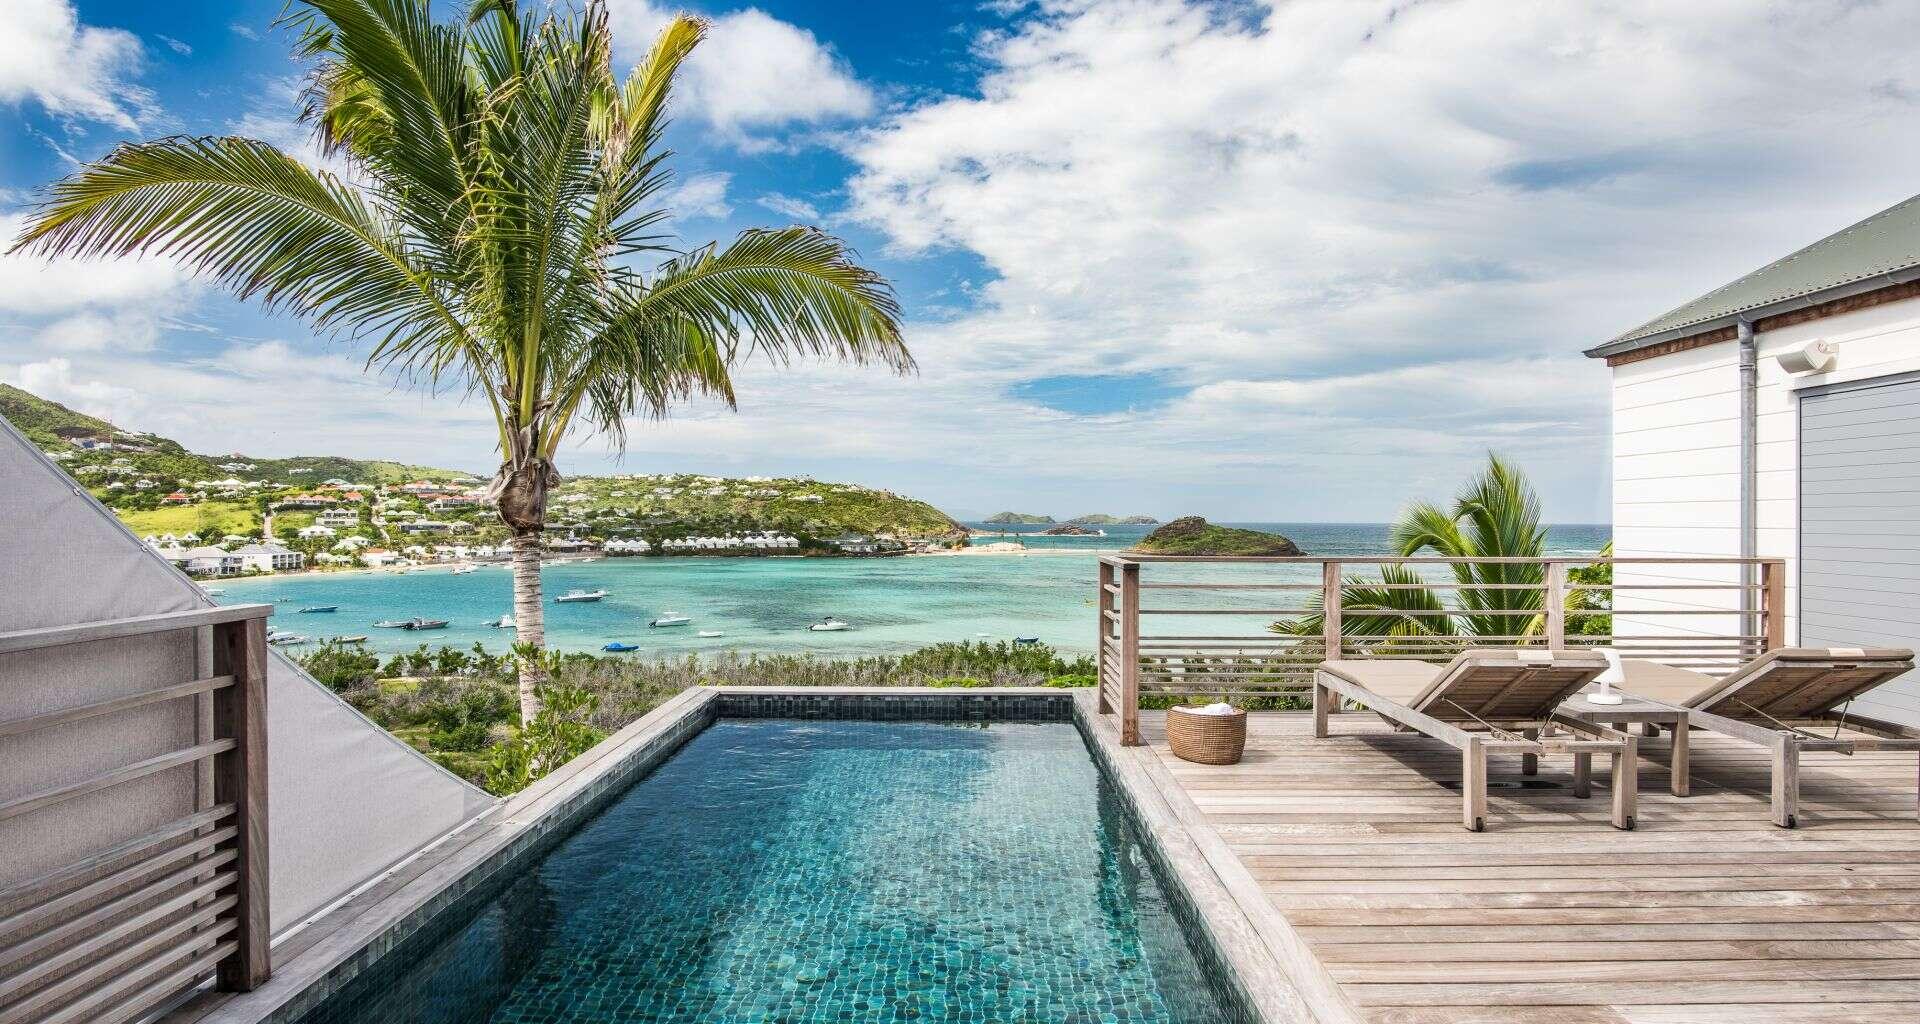 Luxury villa rentals caribbean - St barthelemy - Grand cul de sac - Pink Flamingo - Image 1/10